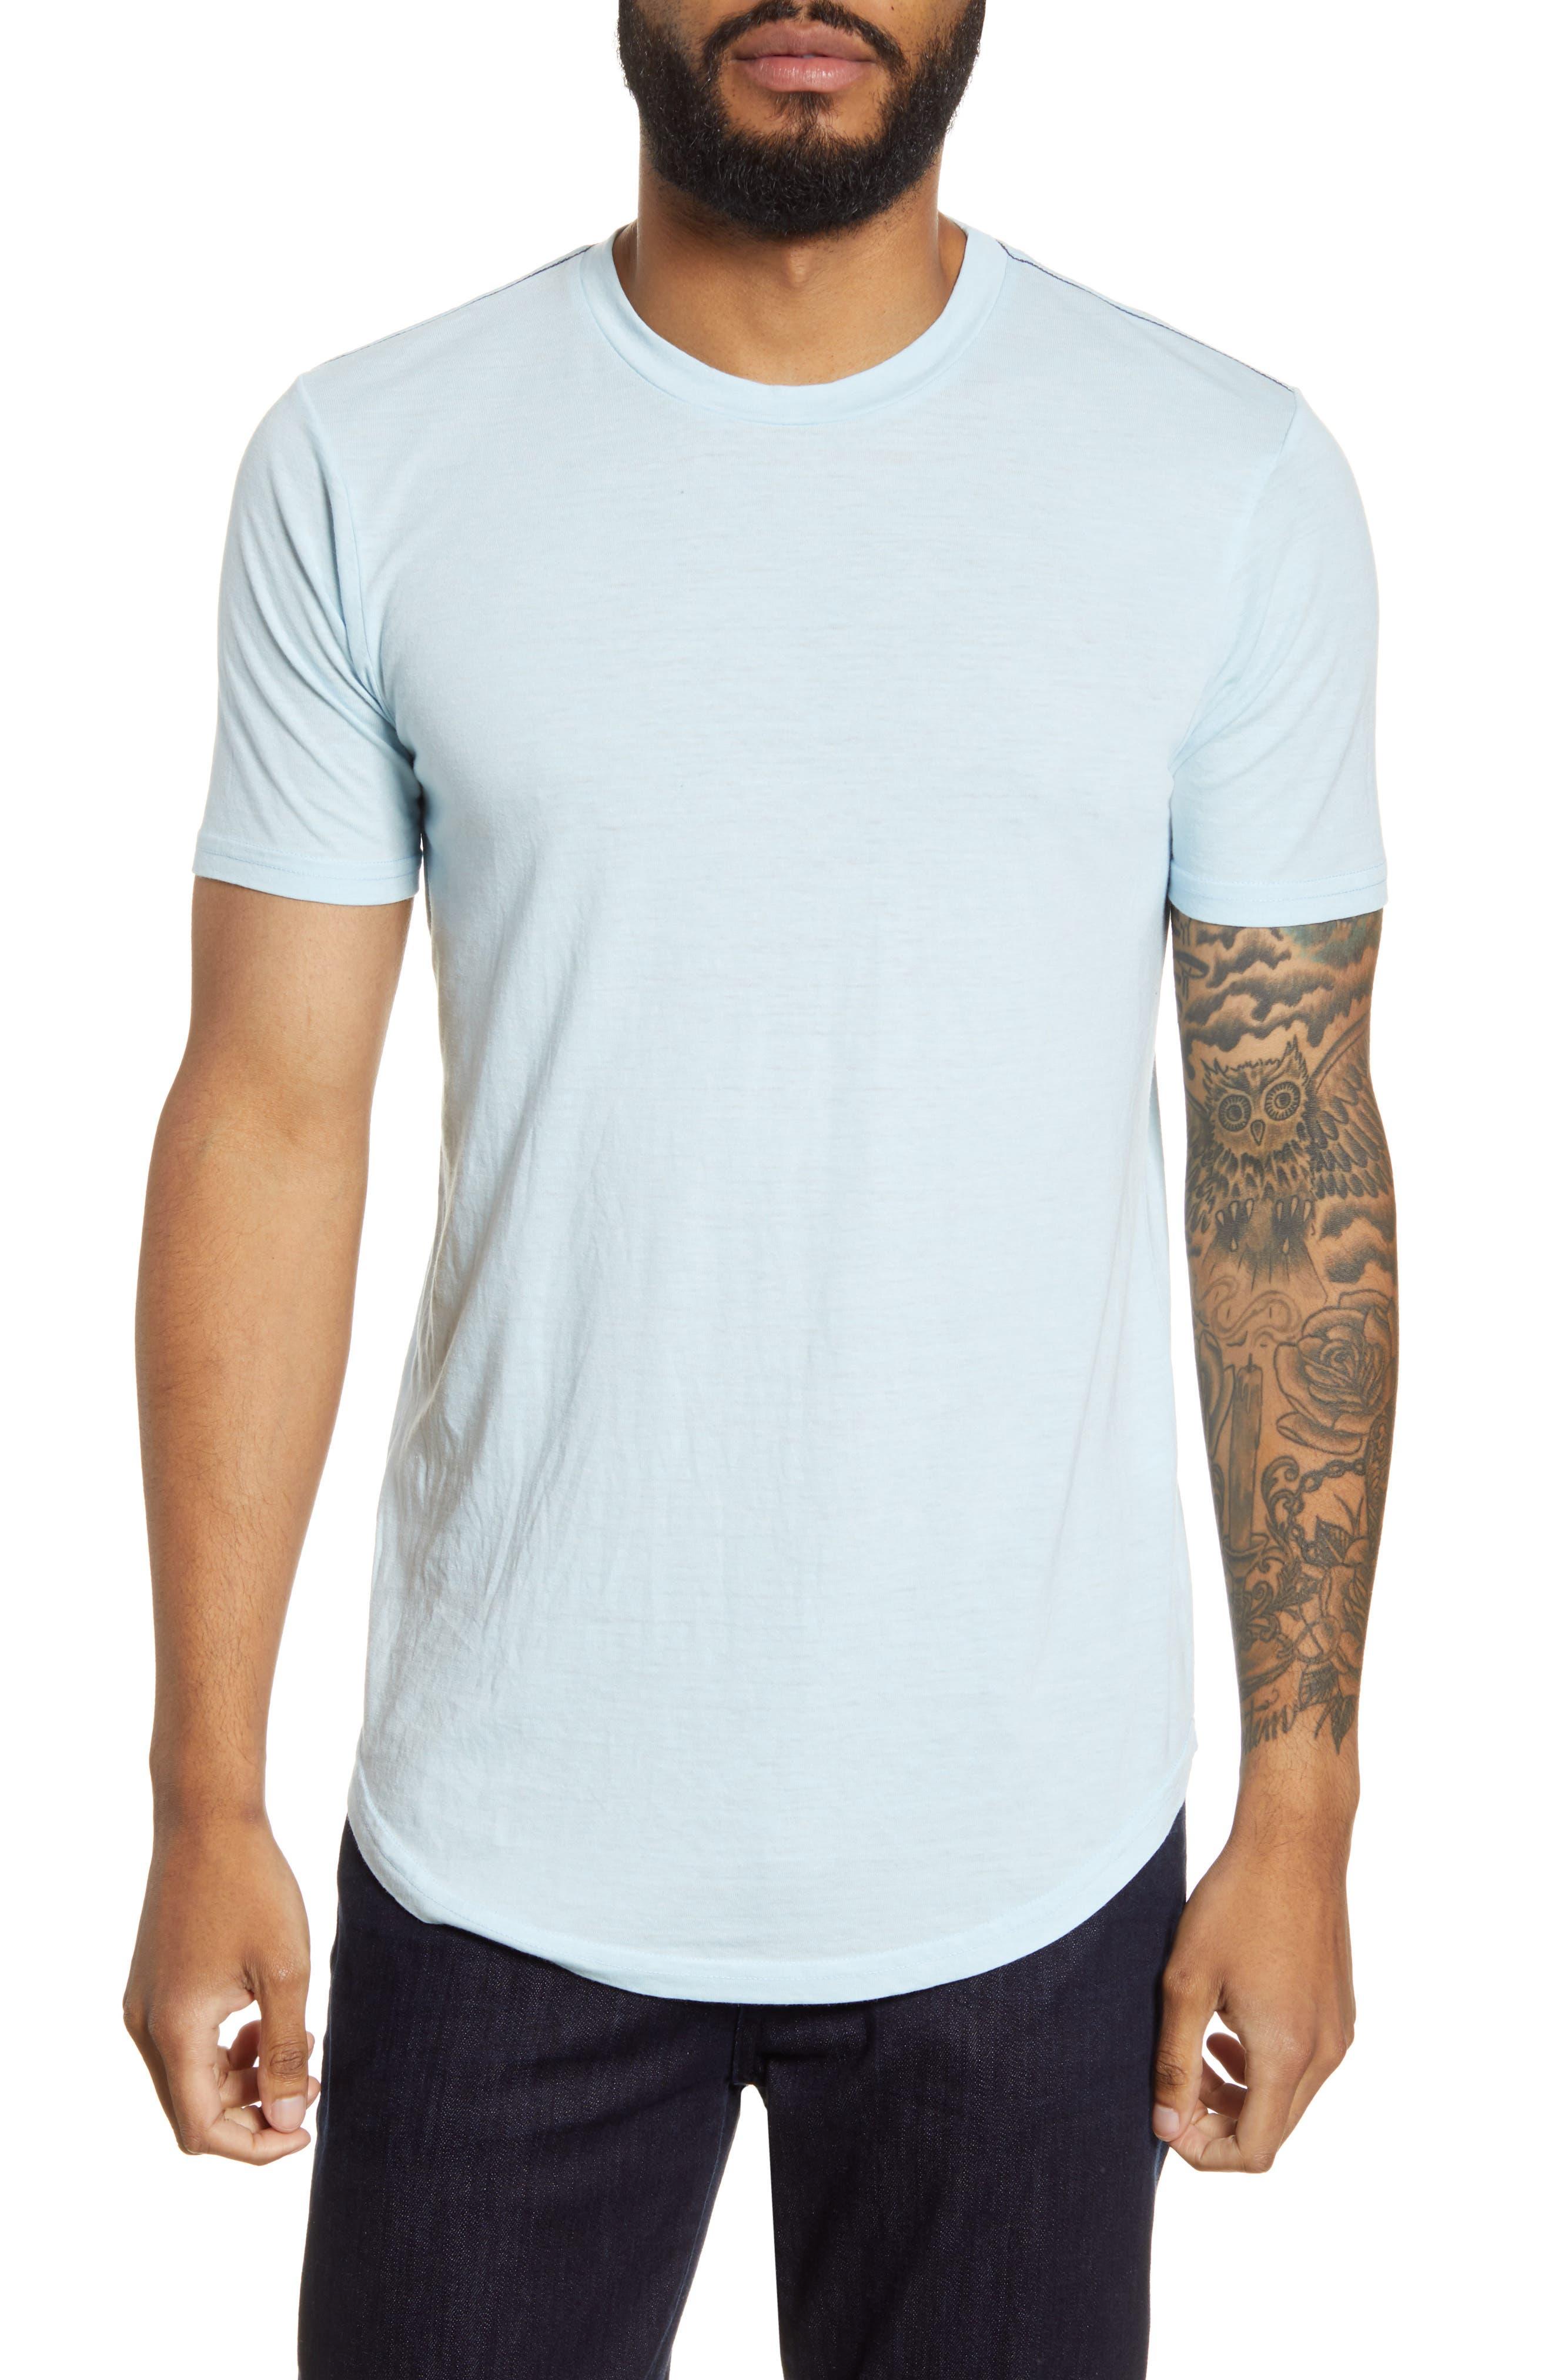 Triblend Scallop Crewneck T-Shirt